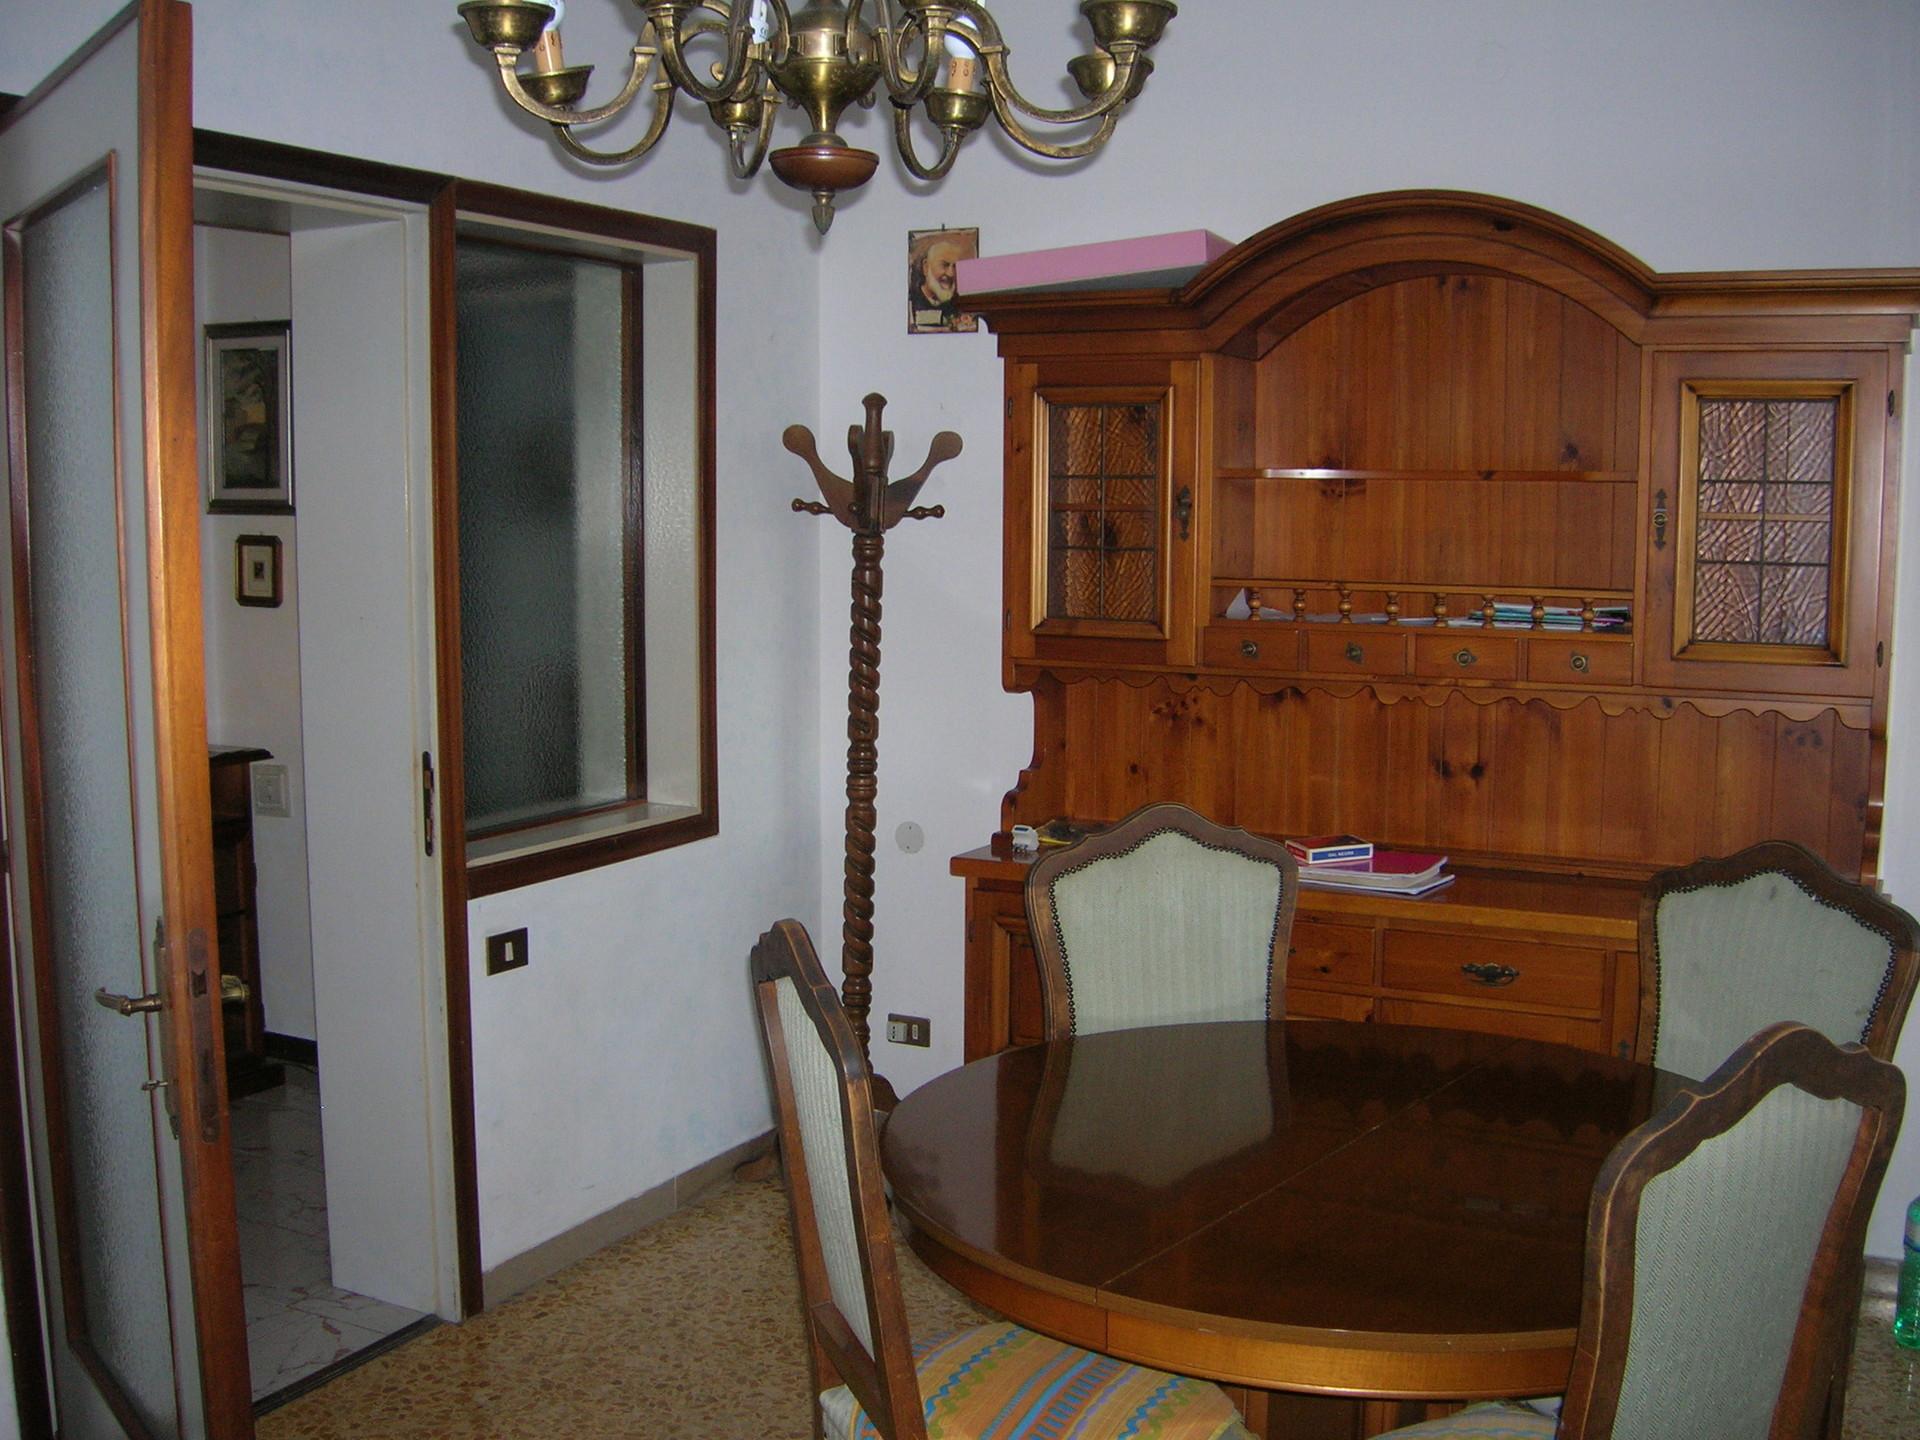 Via Giorgio Vasari, 56122 Pisa PI, Italy